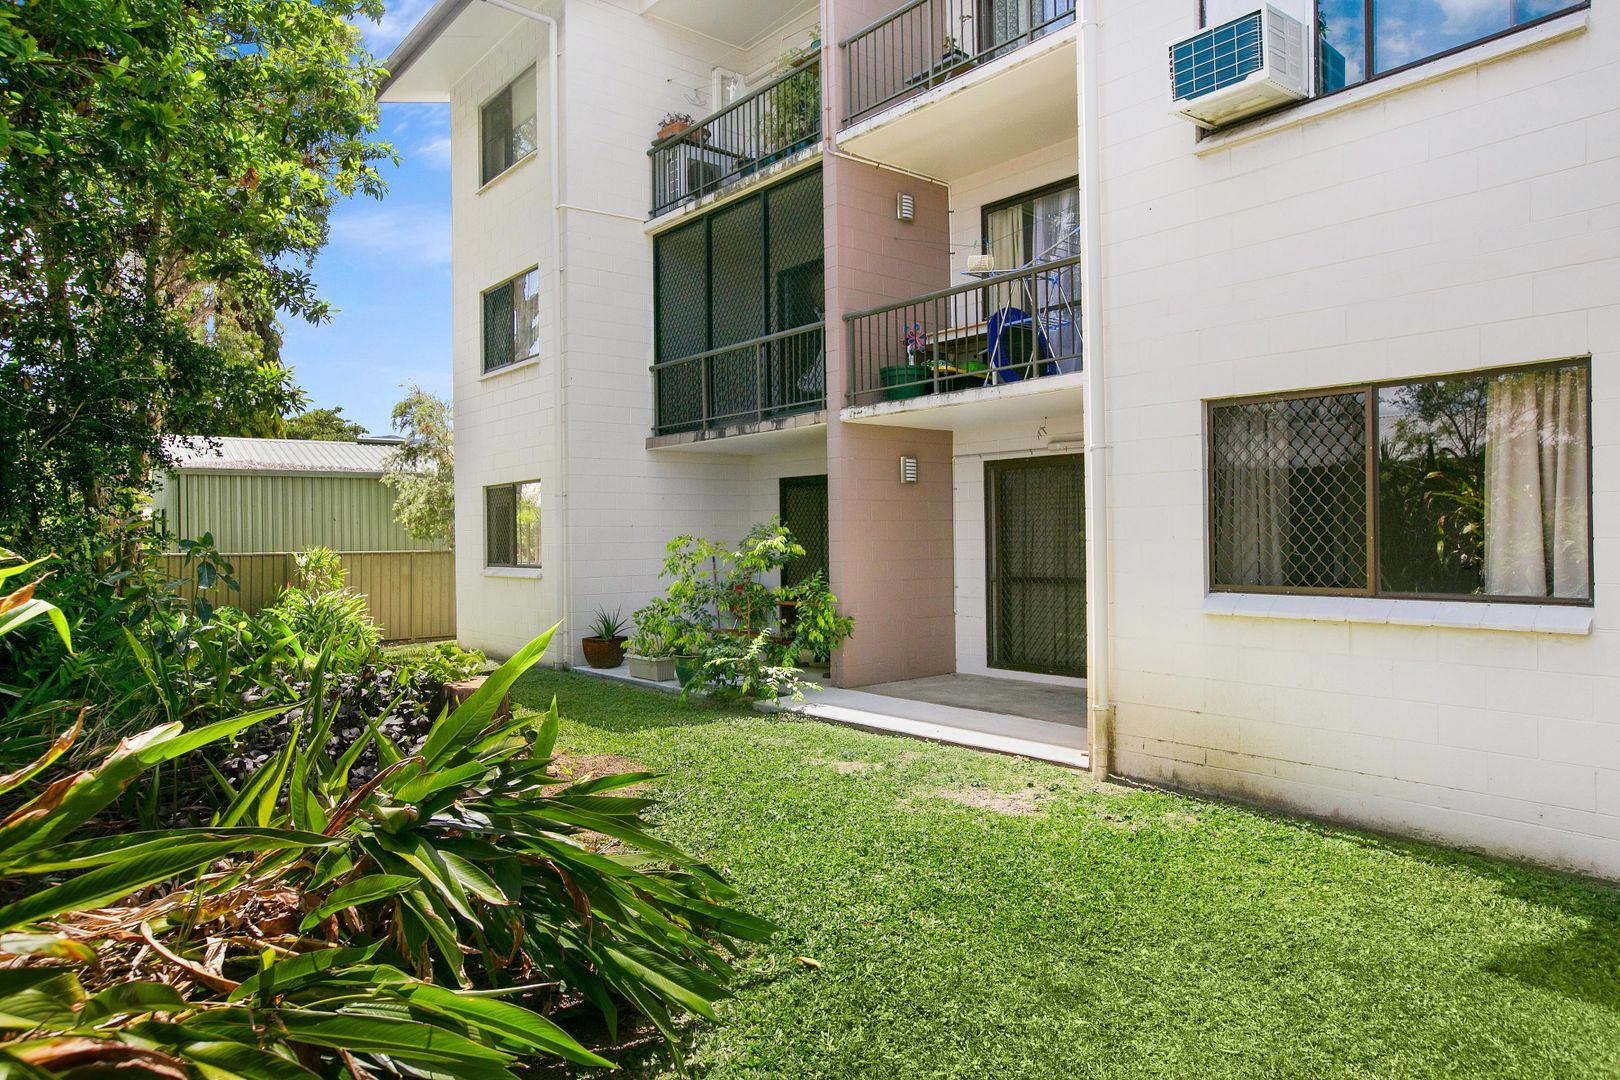 10/173-179 Mayers Street, Manoora QLD 4870, Image 1